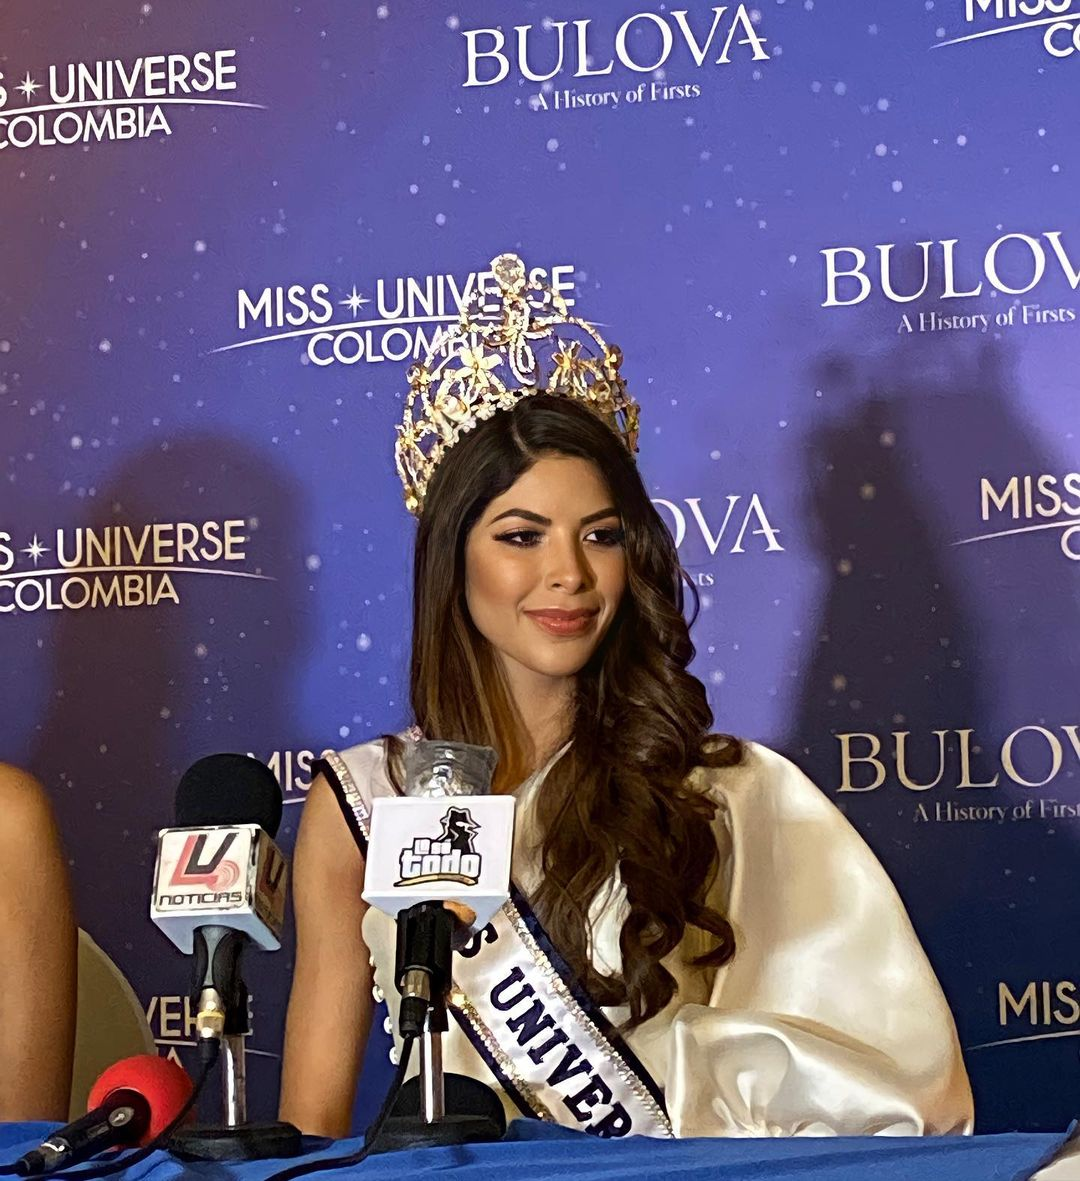 laura olascuaga, miss colombia universo 2020. - Página 5 Missol16